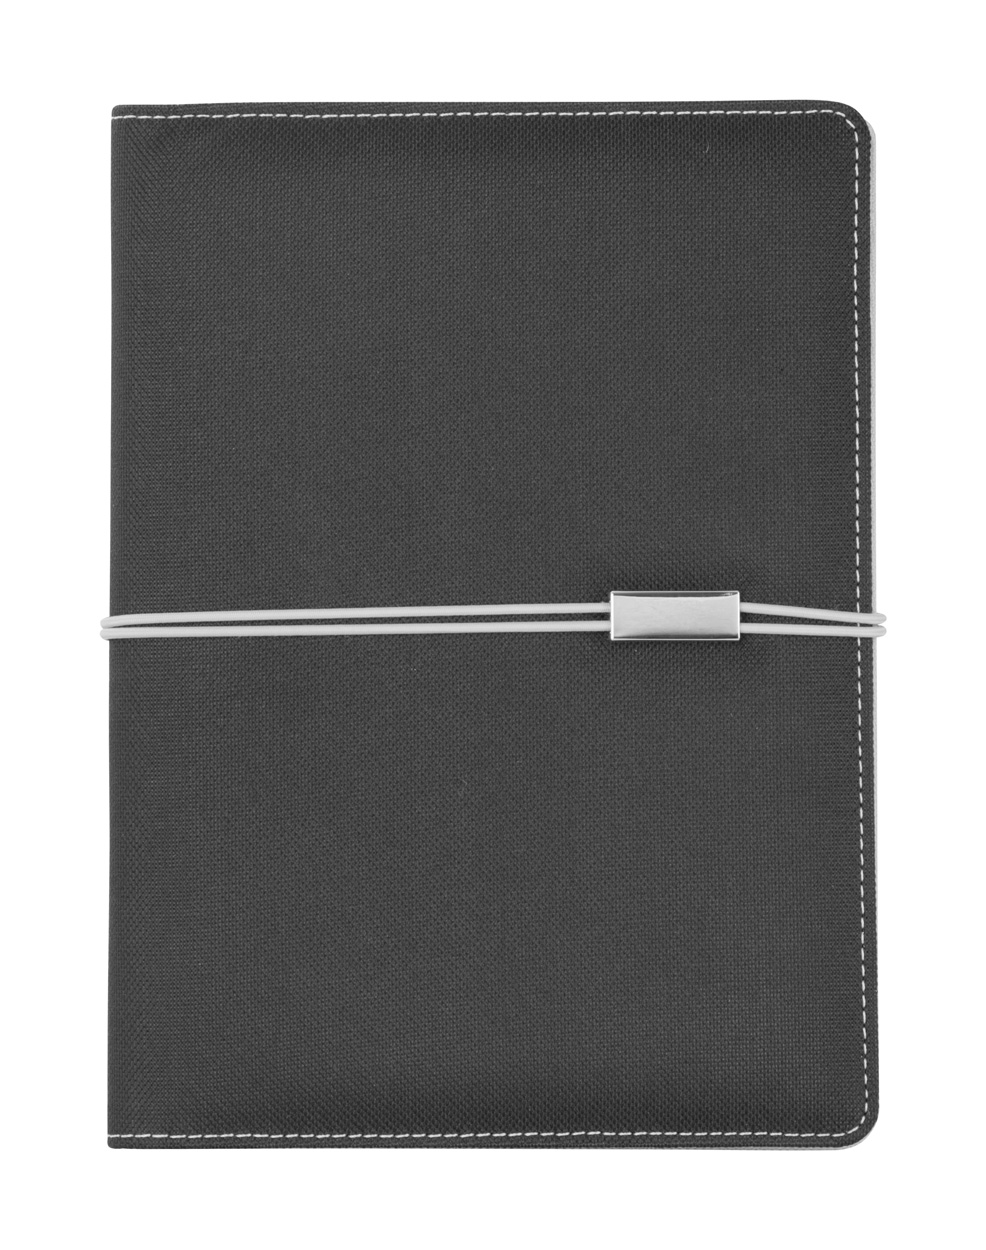 Wally A5 A5 document folder